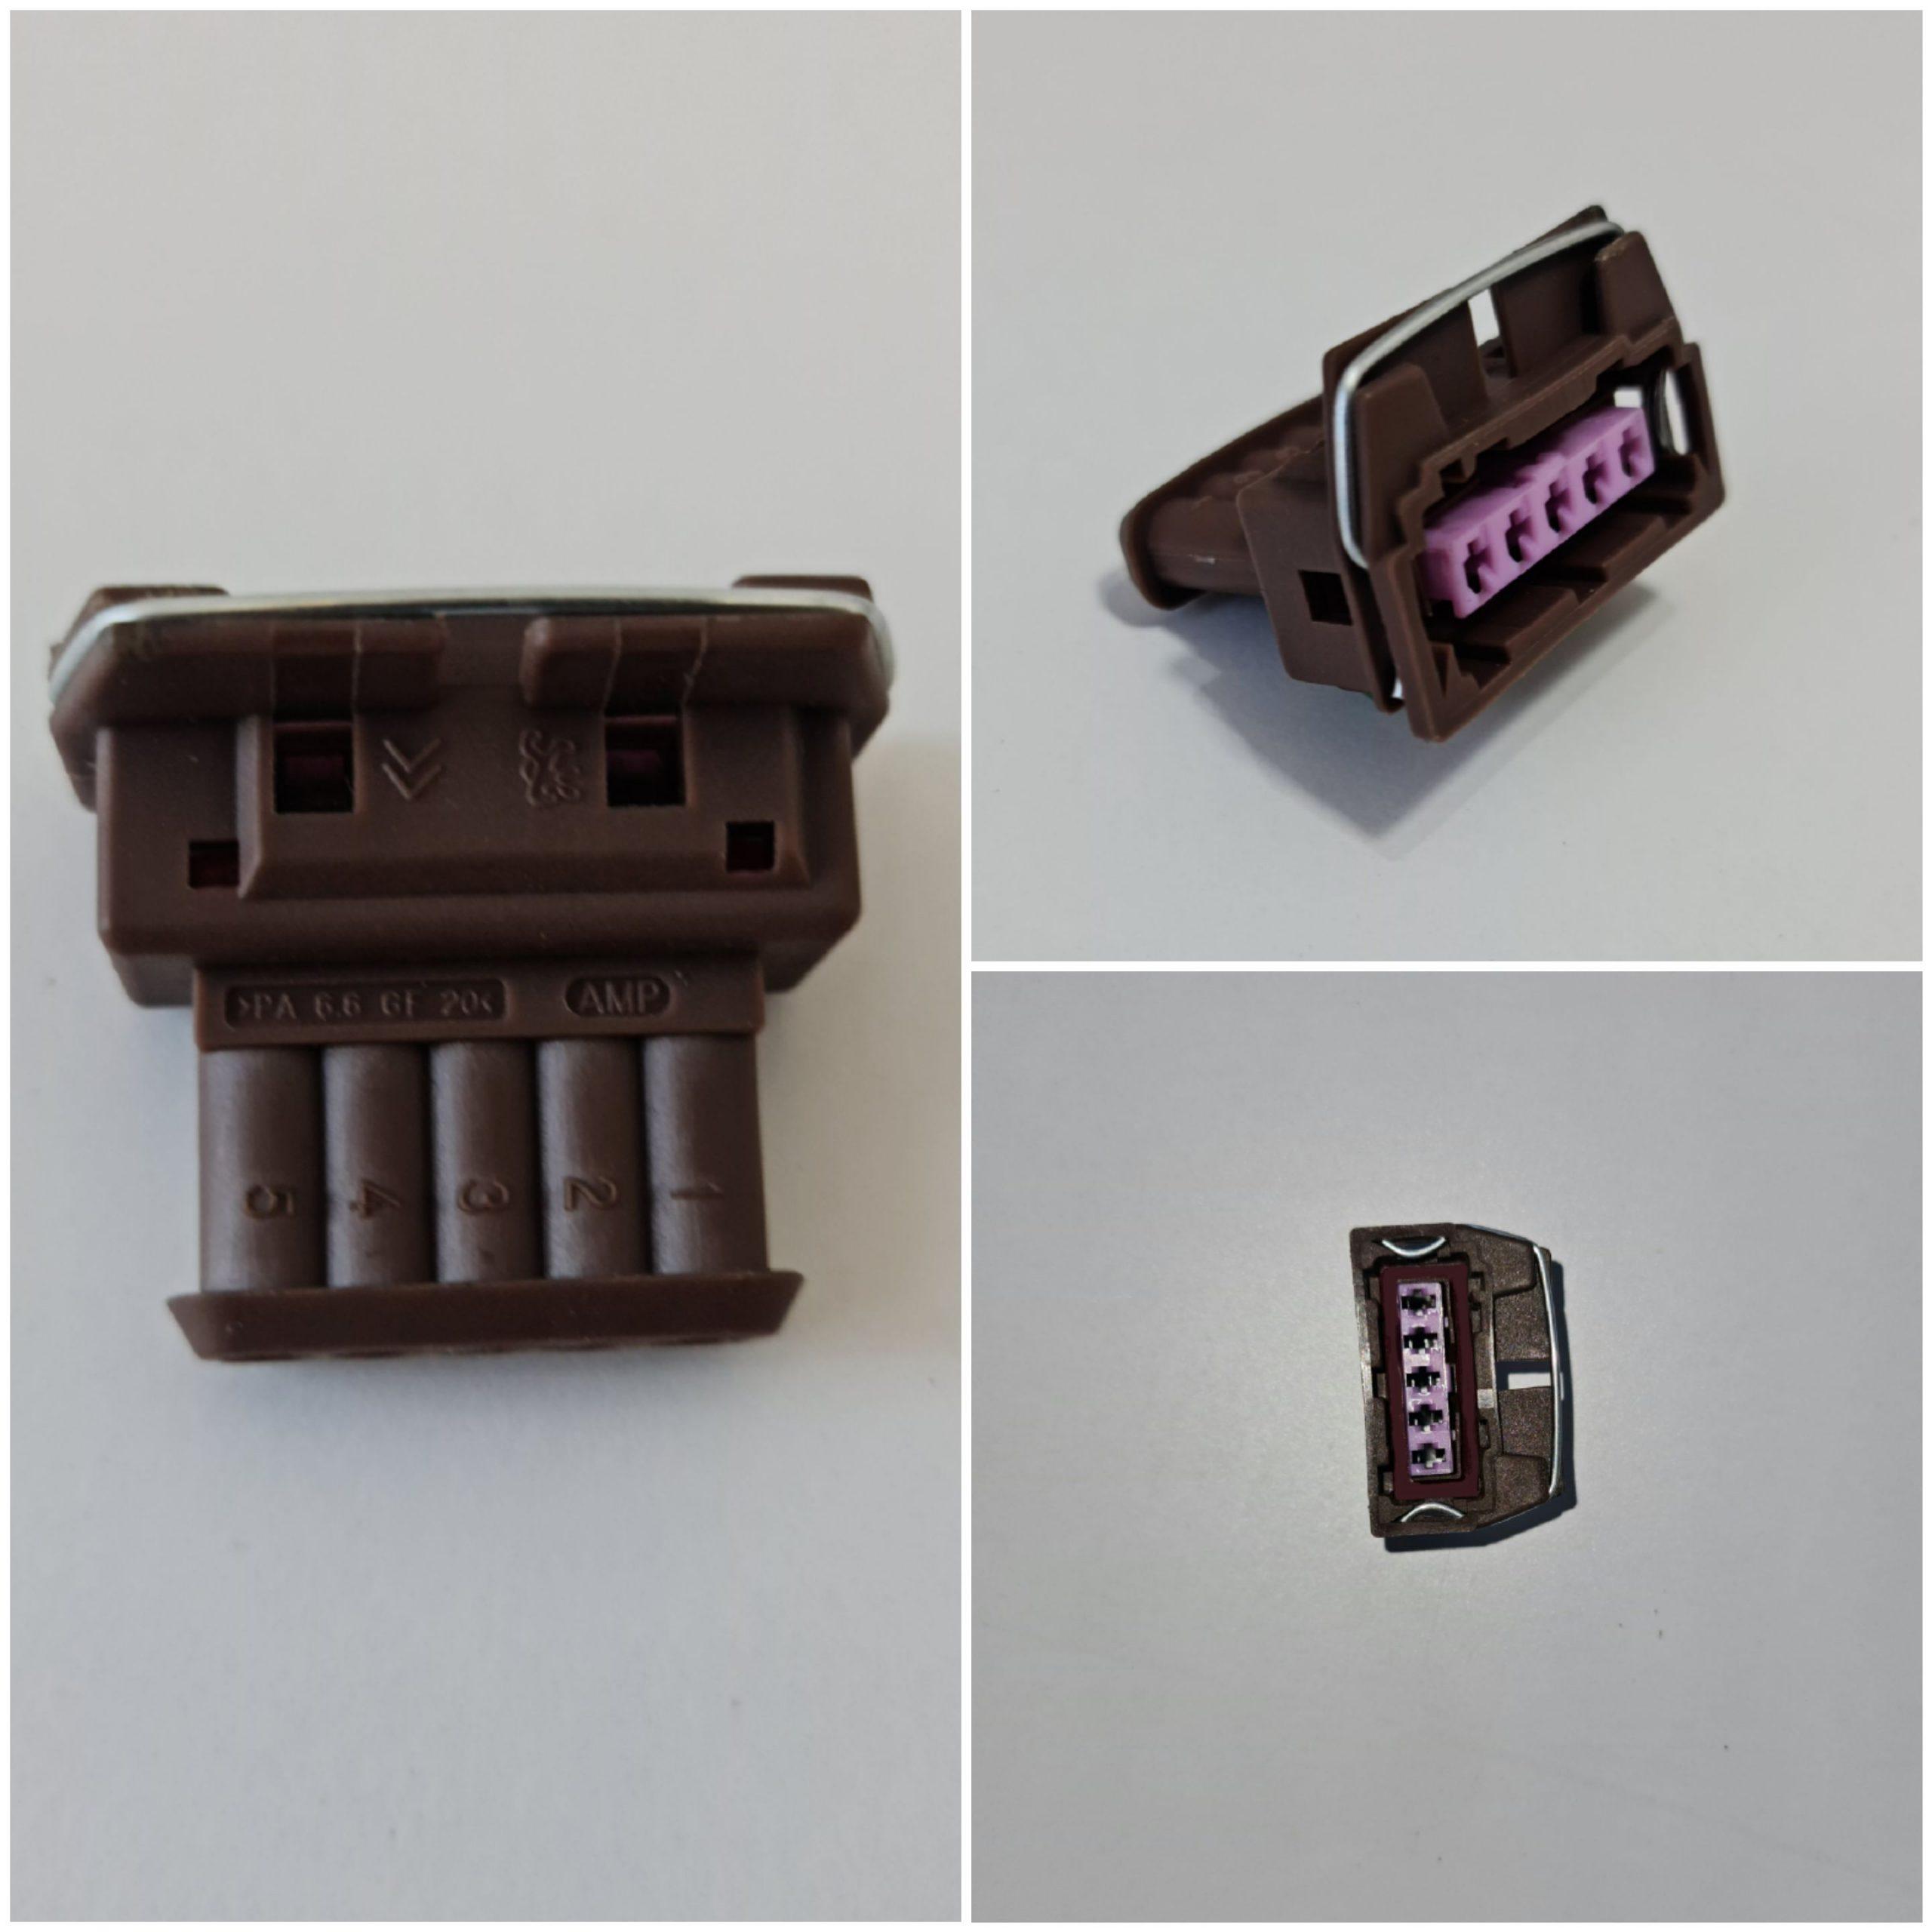 سوکت ۵ خانه قهوه ای قفل فنری / کد ۸۳۰۳۷۱